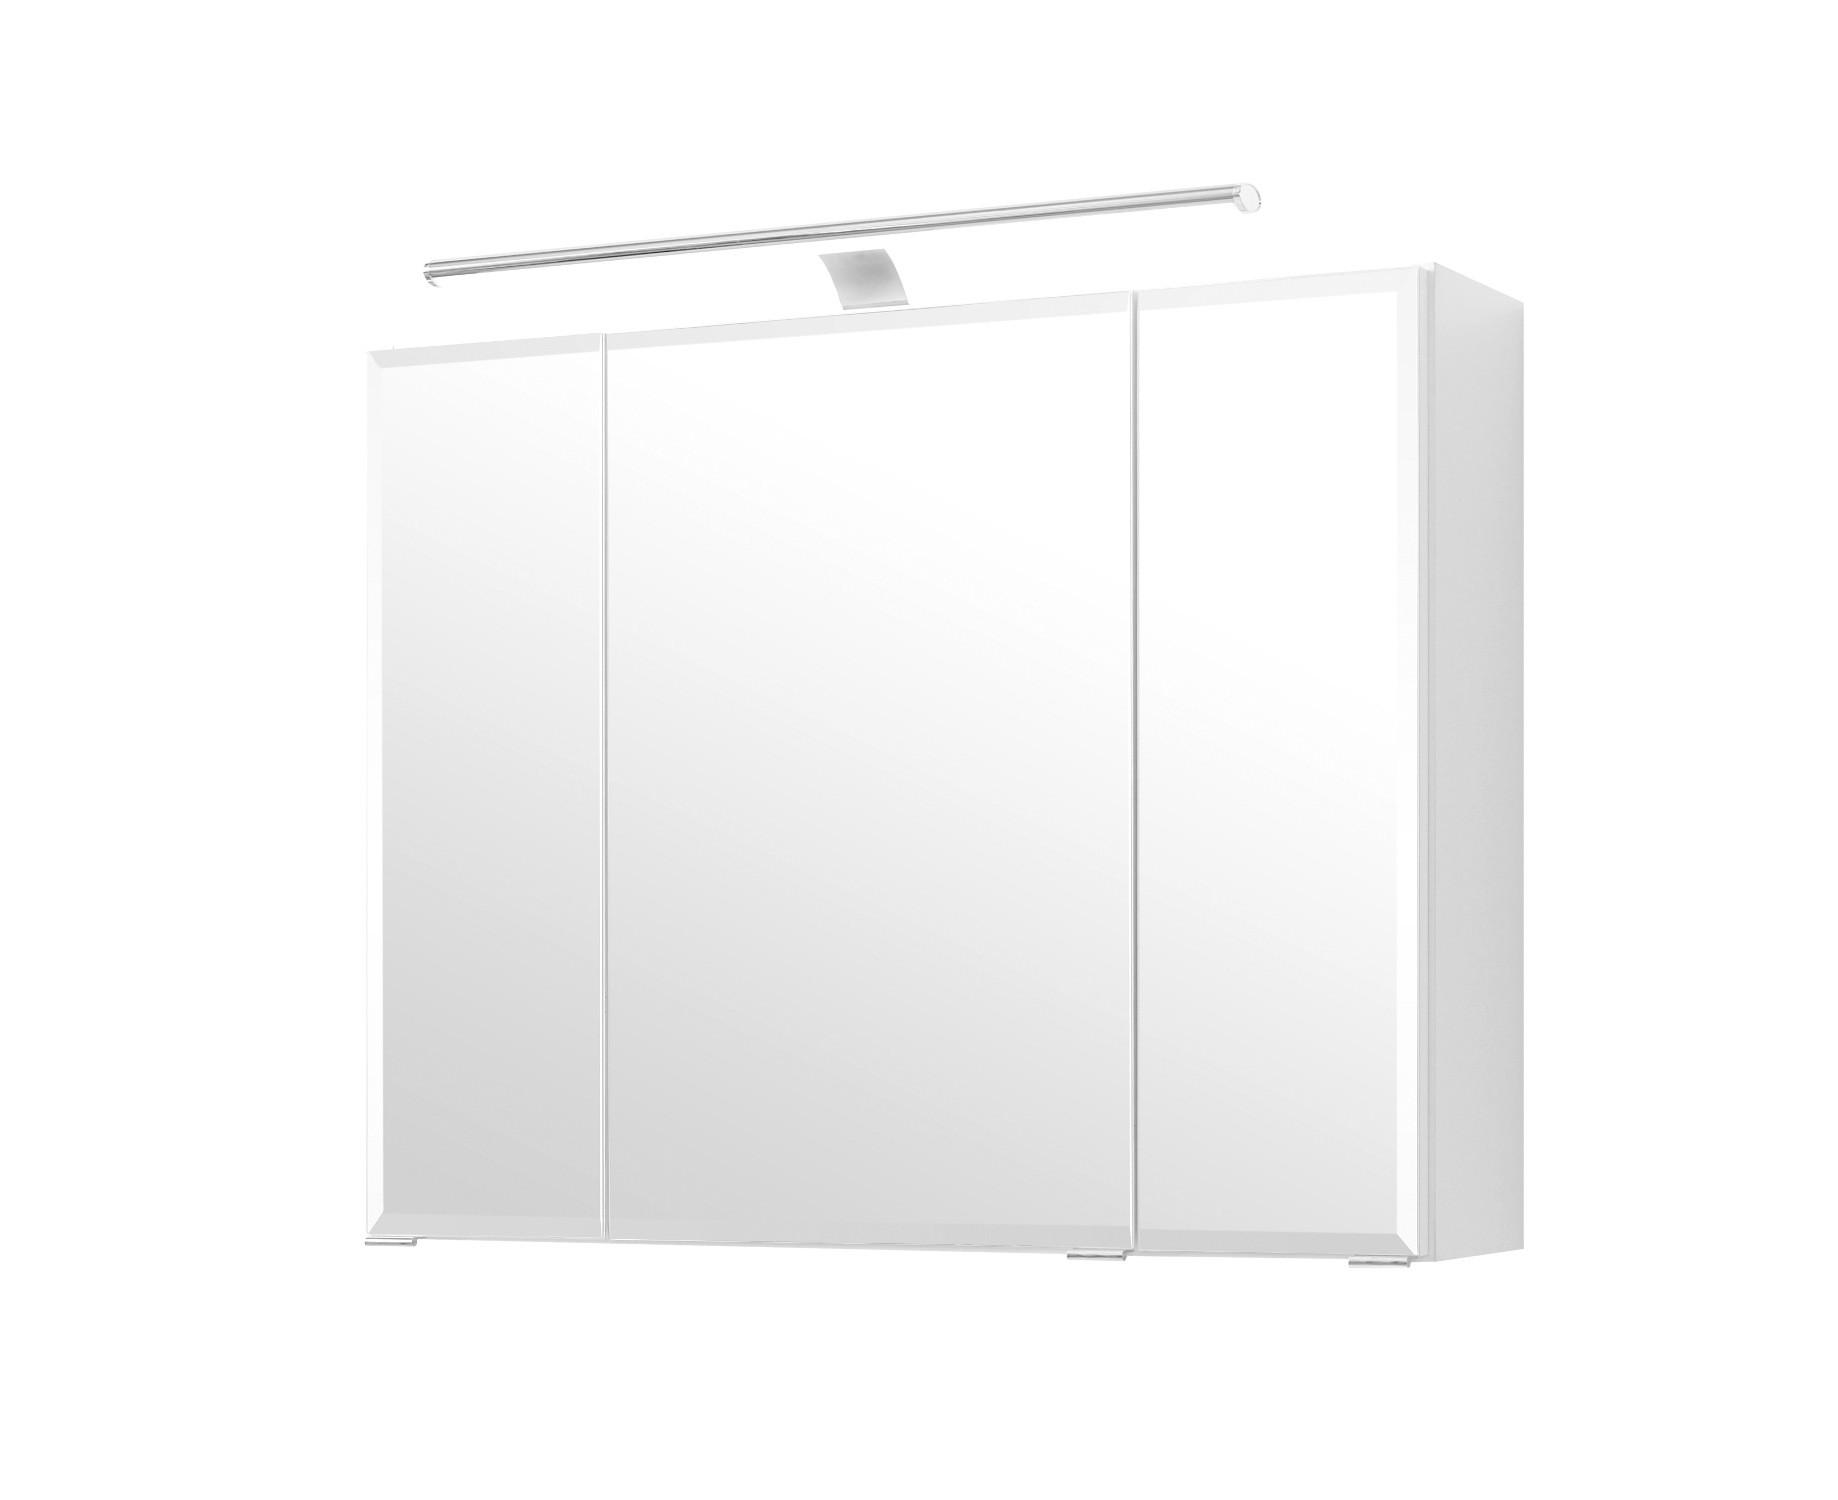 badm bel set fontana mit waschtisch 4 teilig 80 cm breit wei bad badm belsets. Black Bedroom Furniture Sets. Home Design Ideas